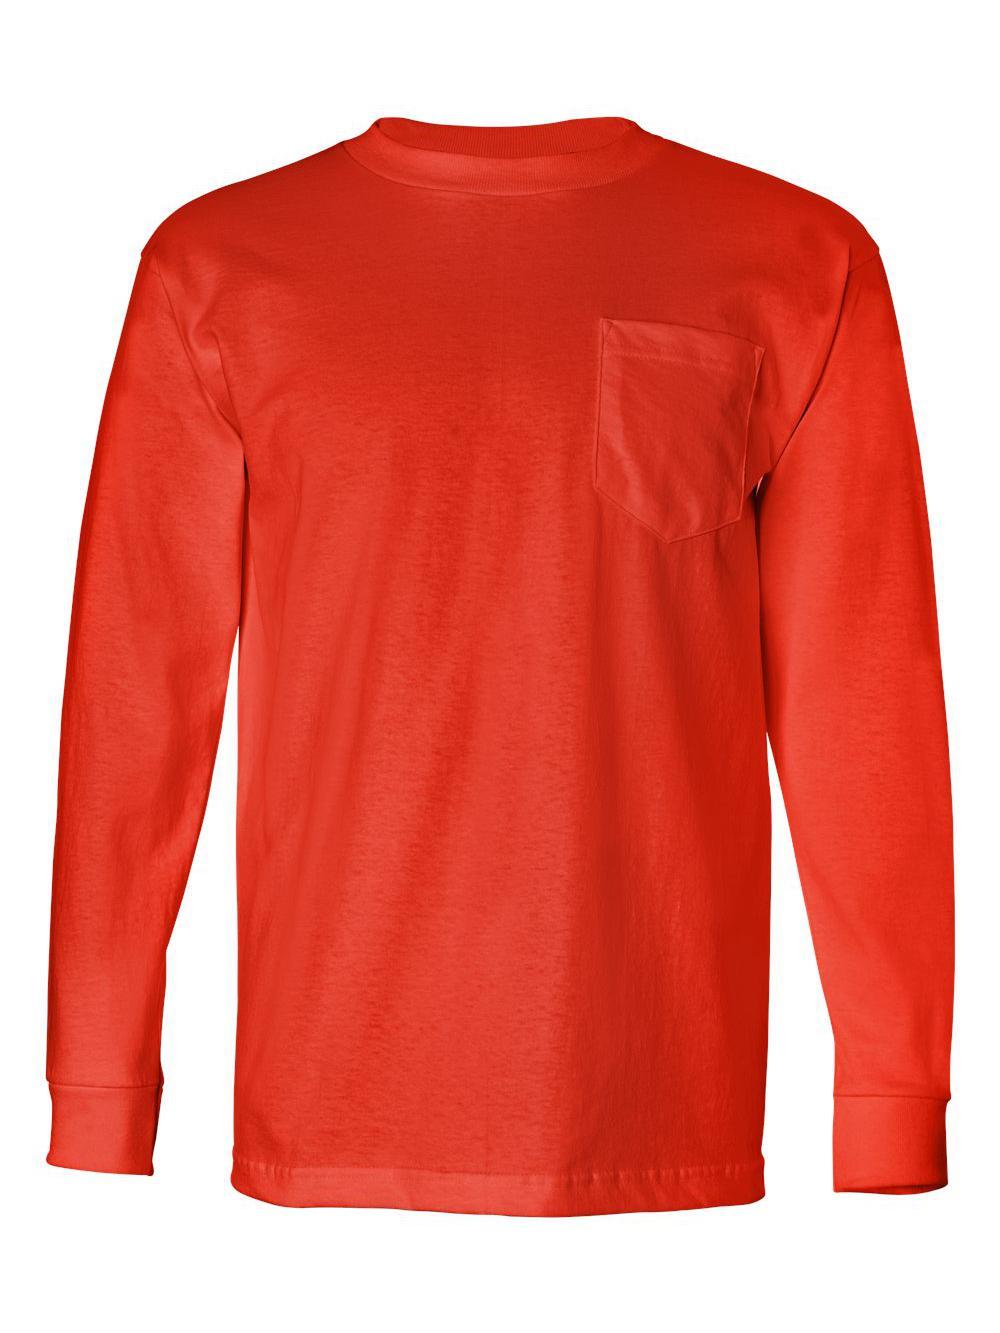 Bayside-USA-Made-Long-Sleeve-T-Shirt-with-a-Pocket-8100 thumbnail 18